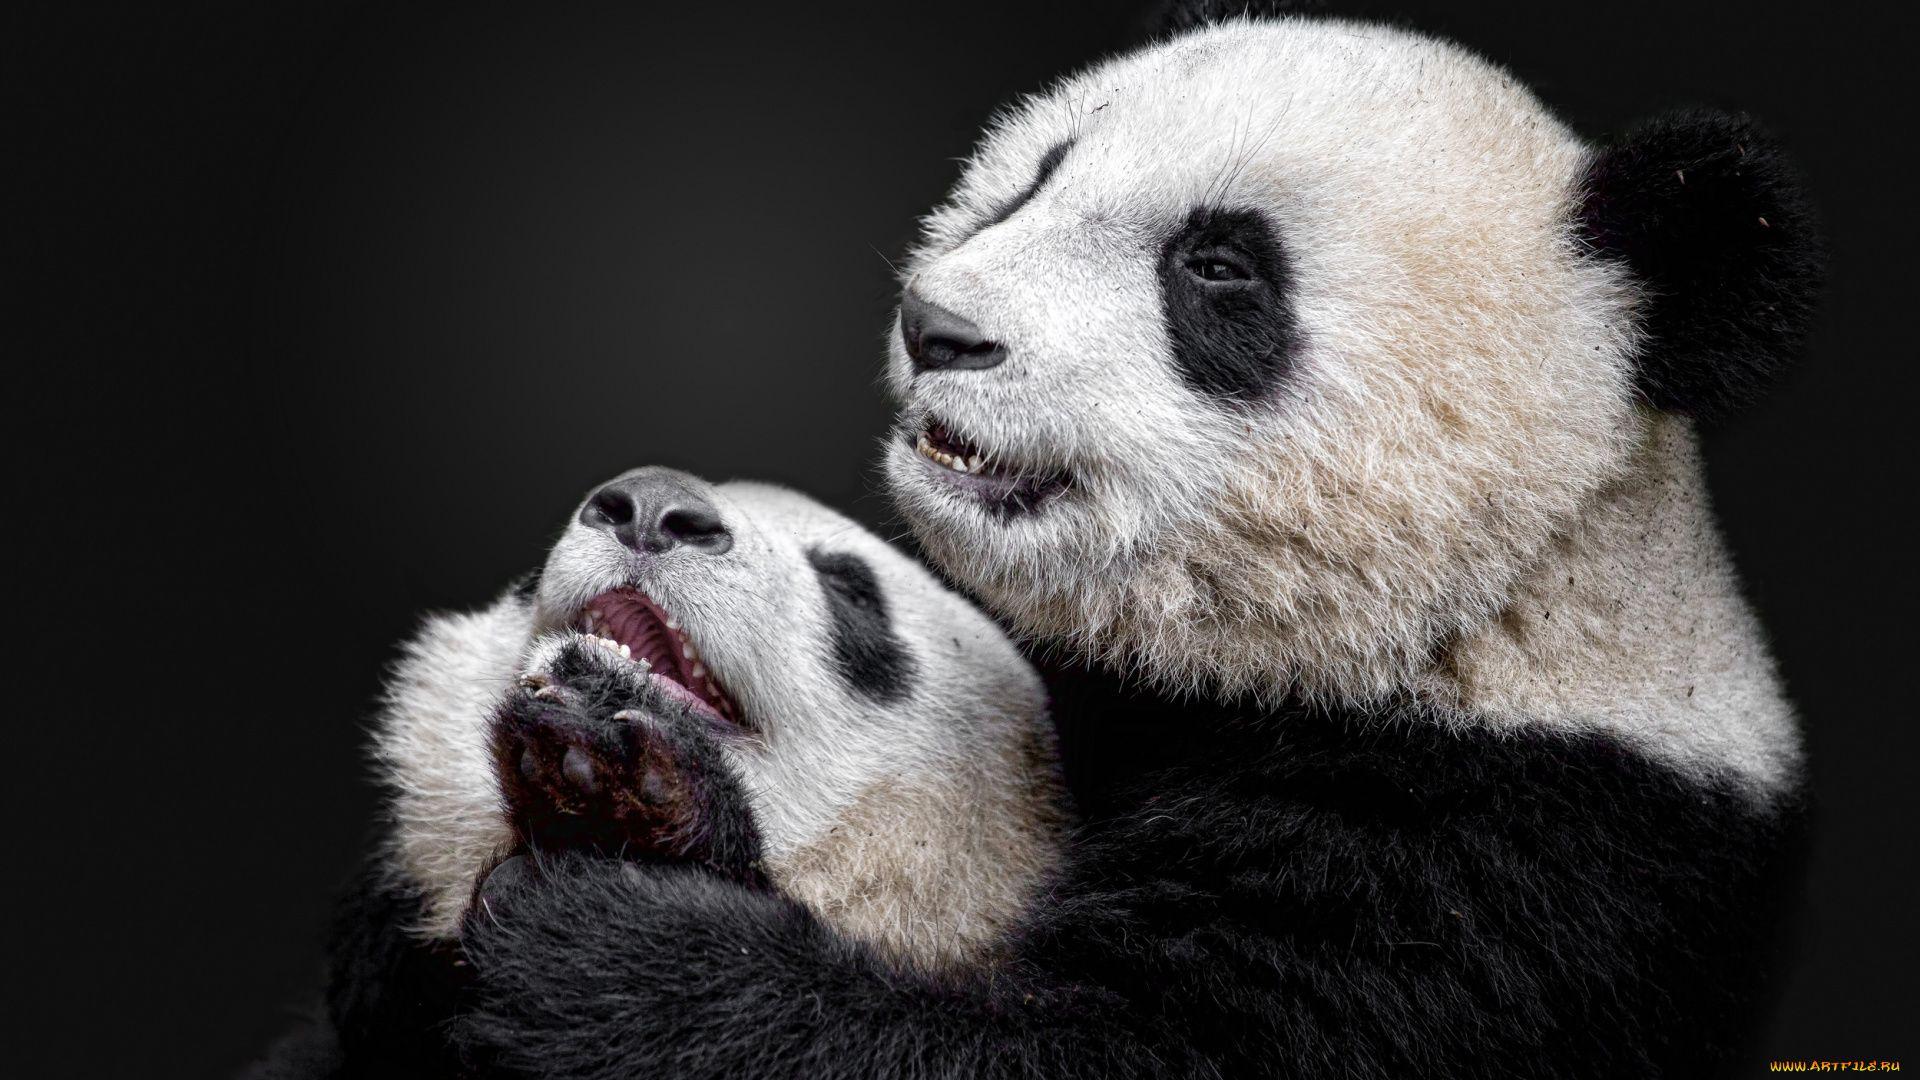 Panda Black And White Photo